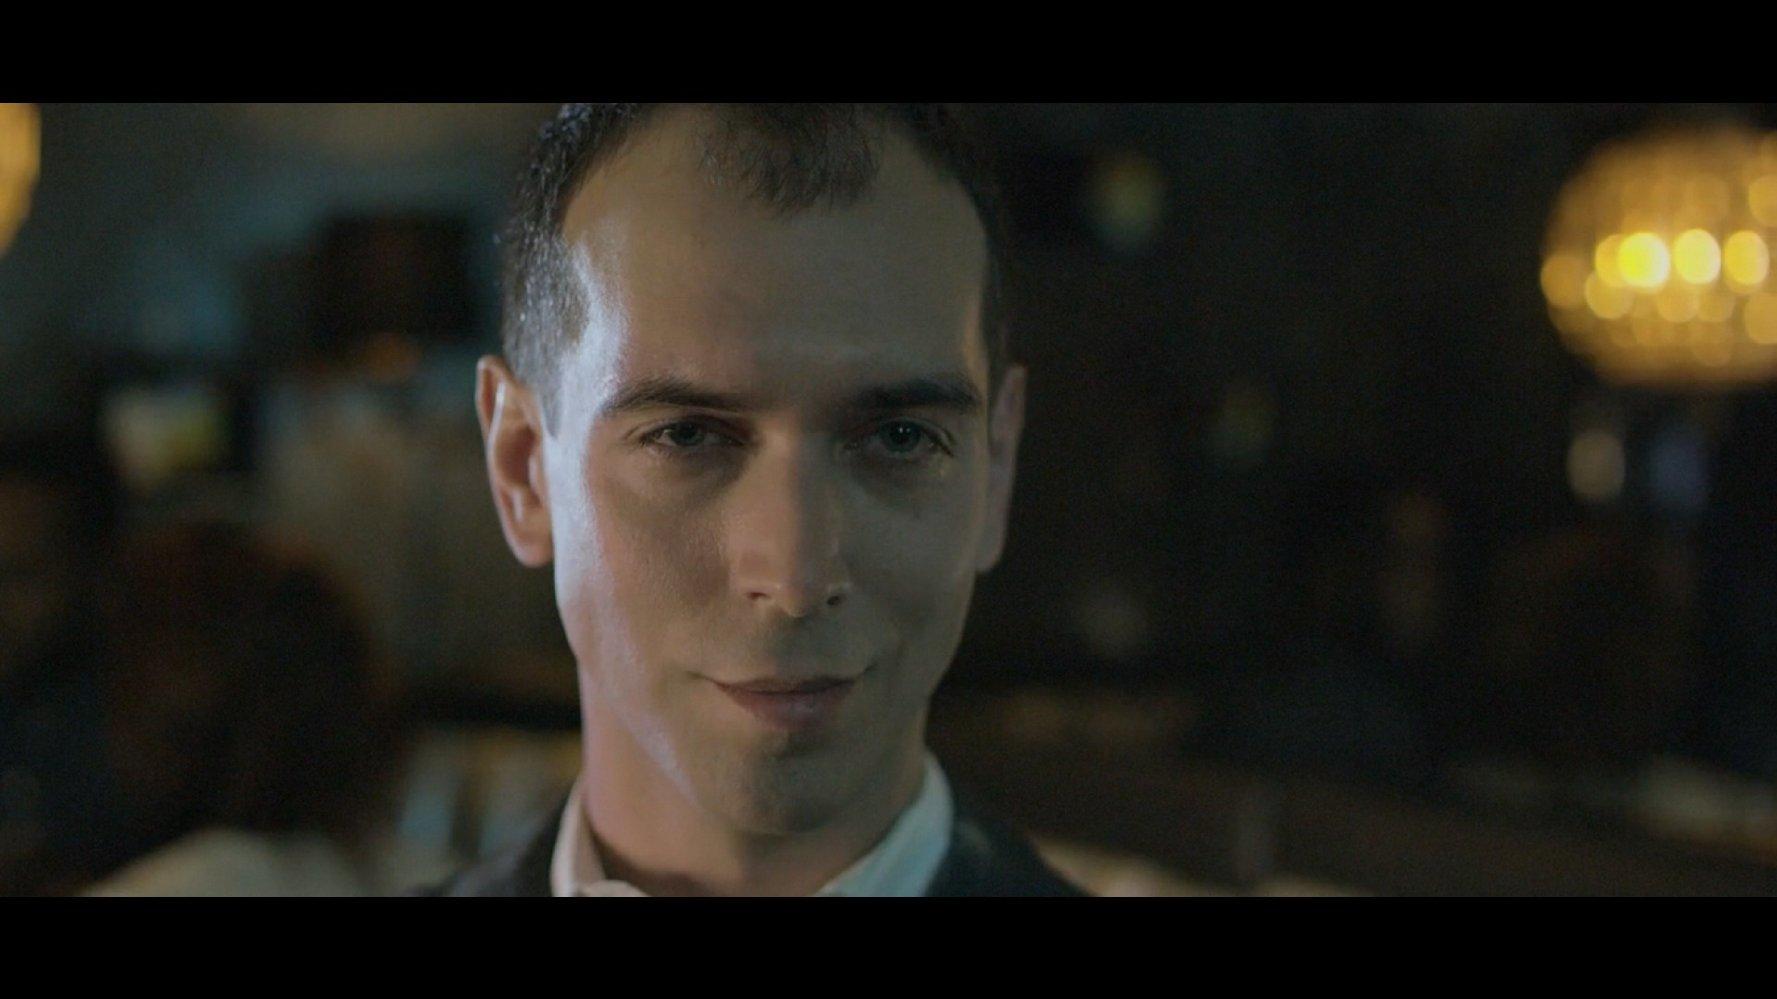 masters of sex involuntary imdb movie in Baltimore